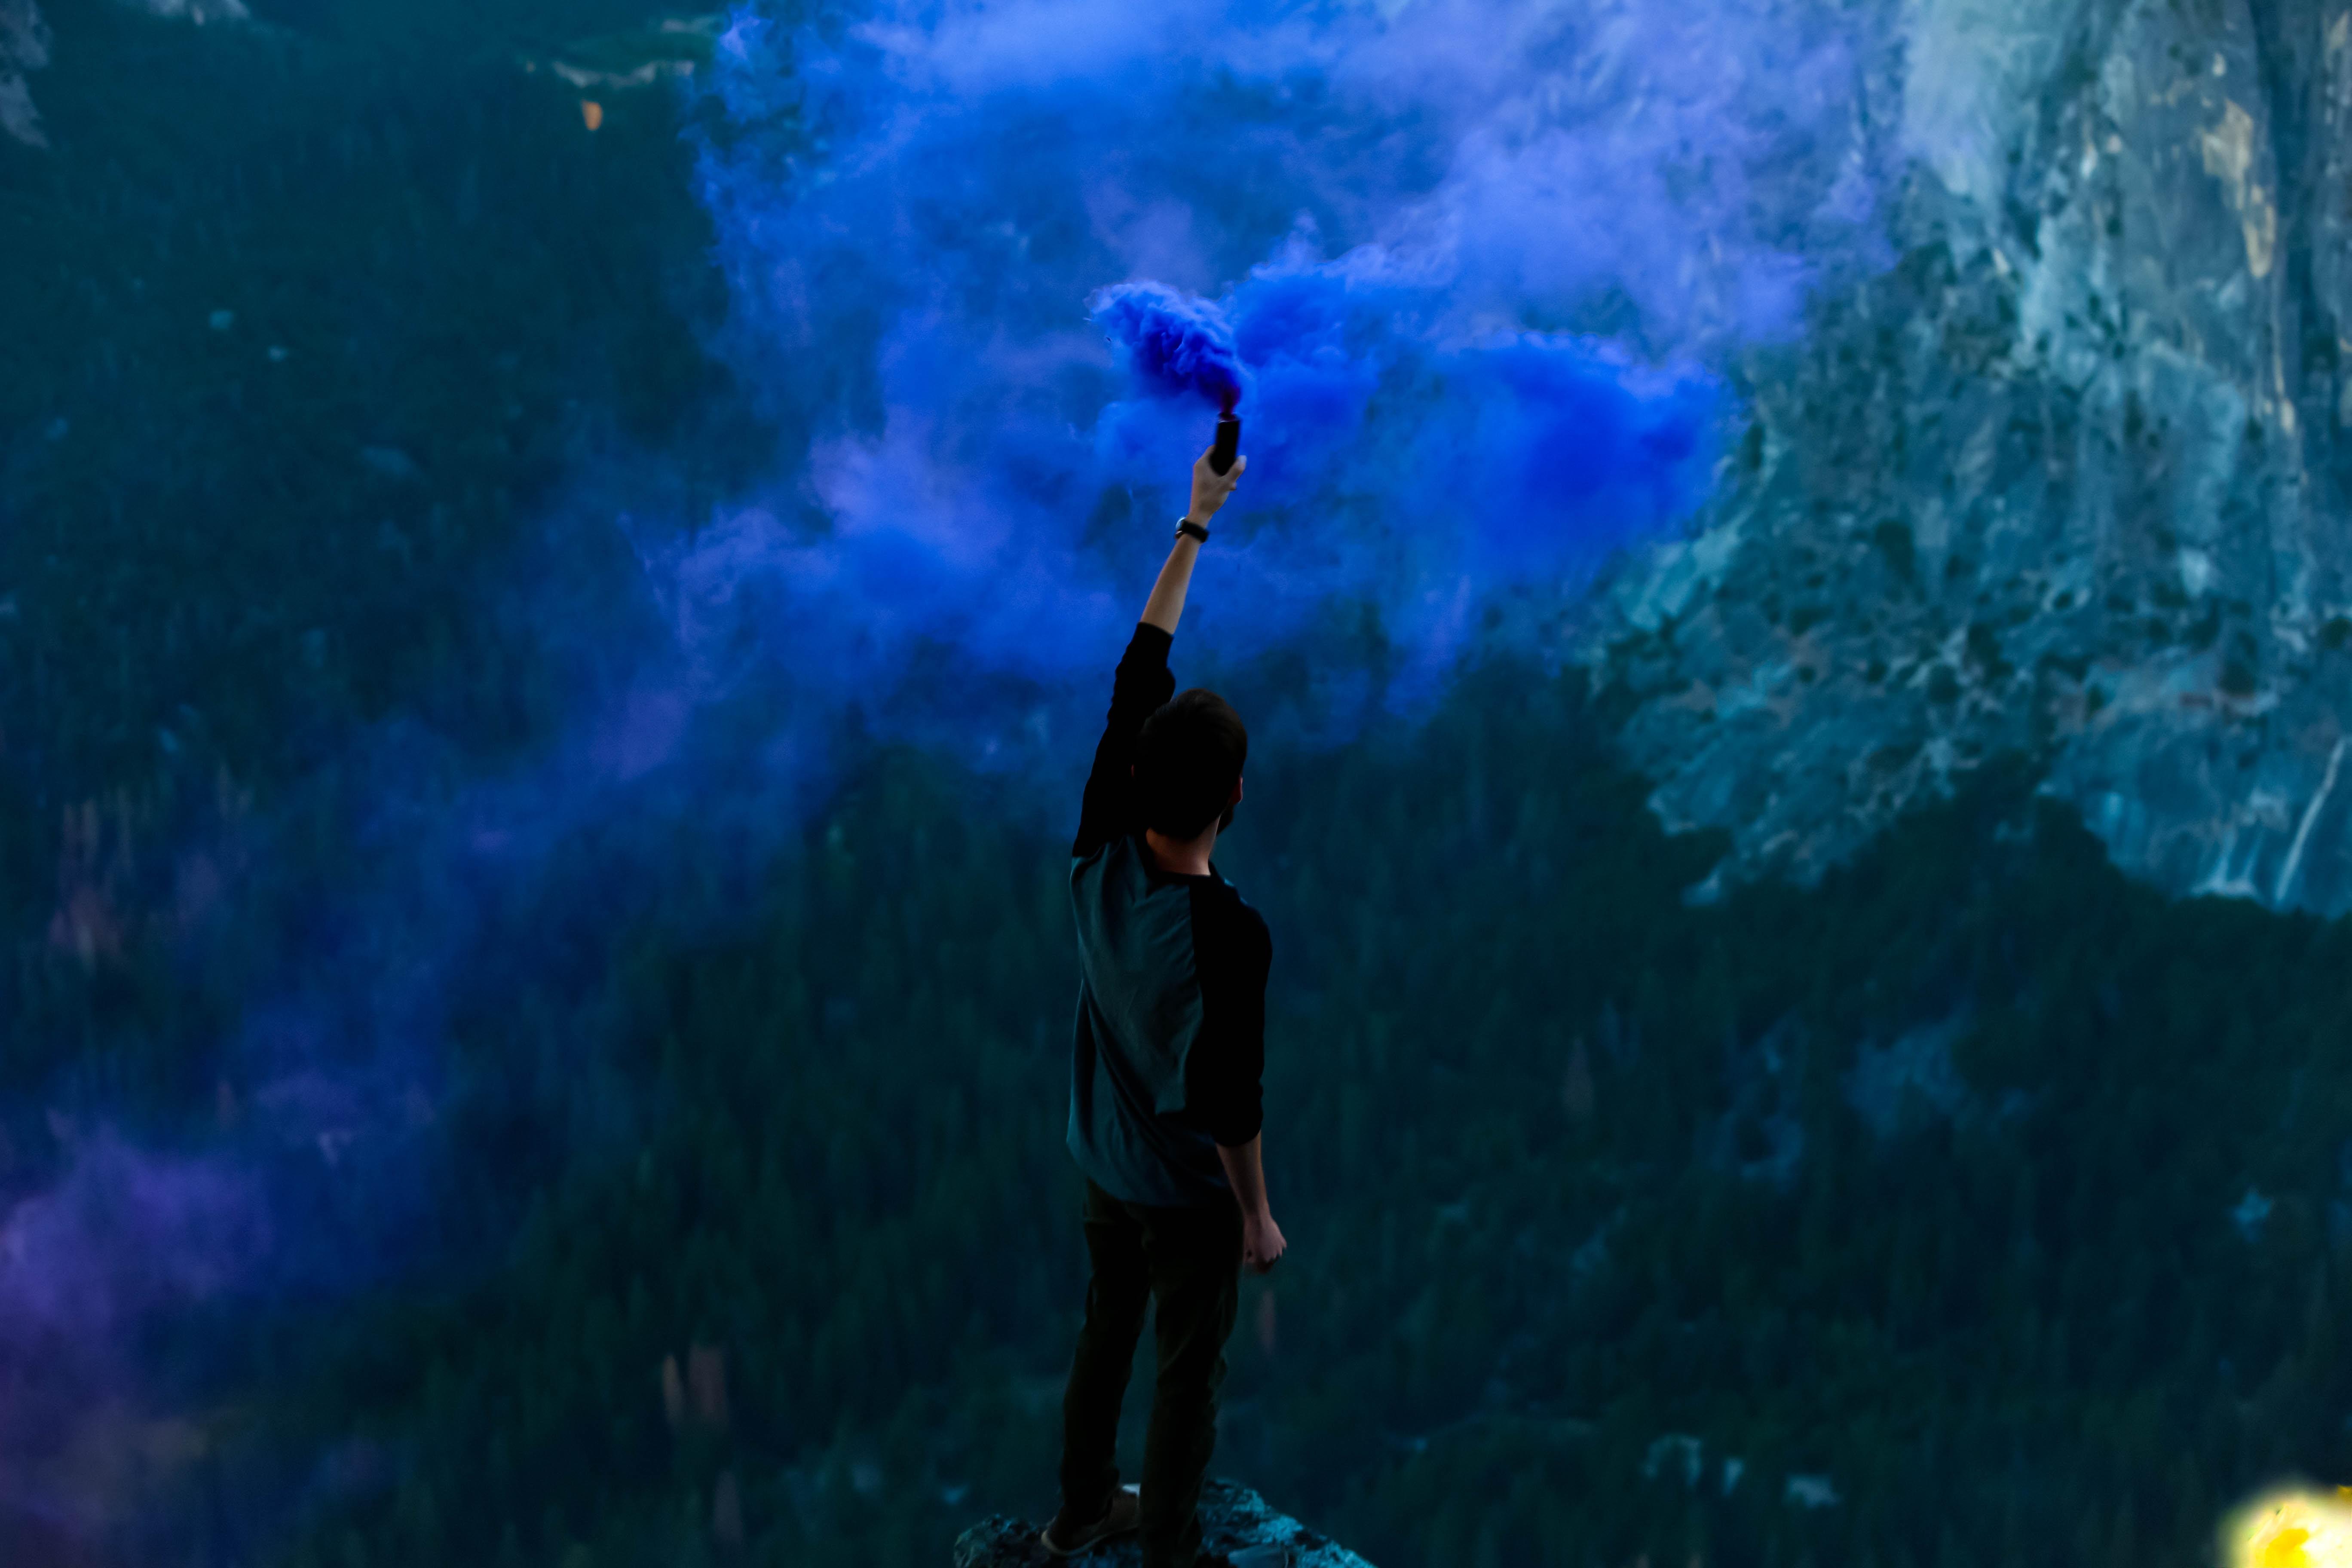 man holding blue powder while raising hand